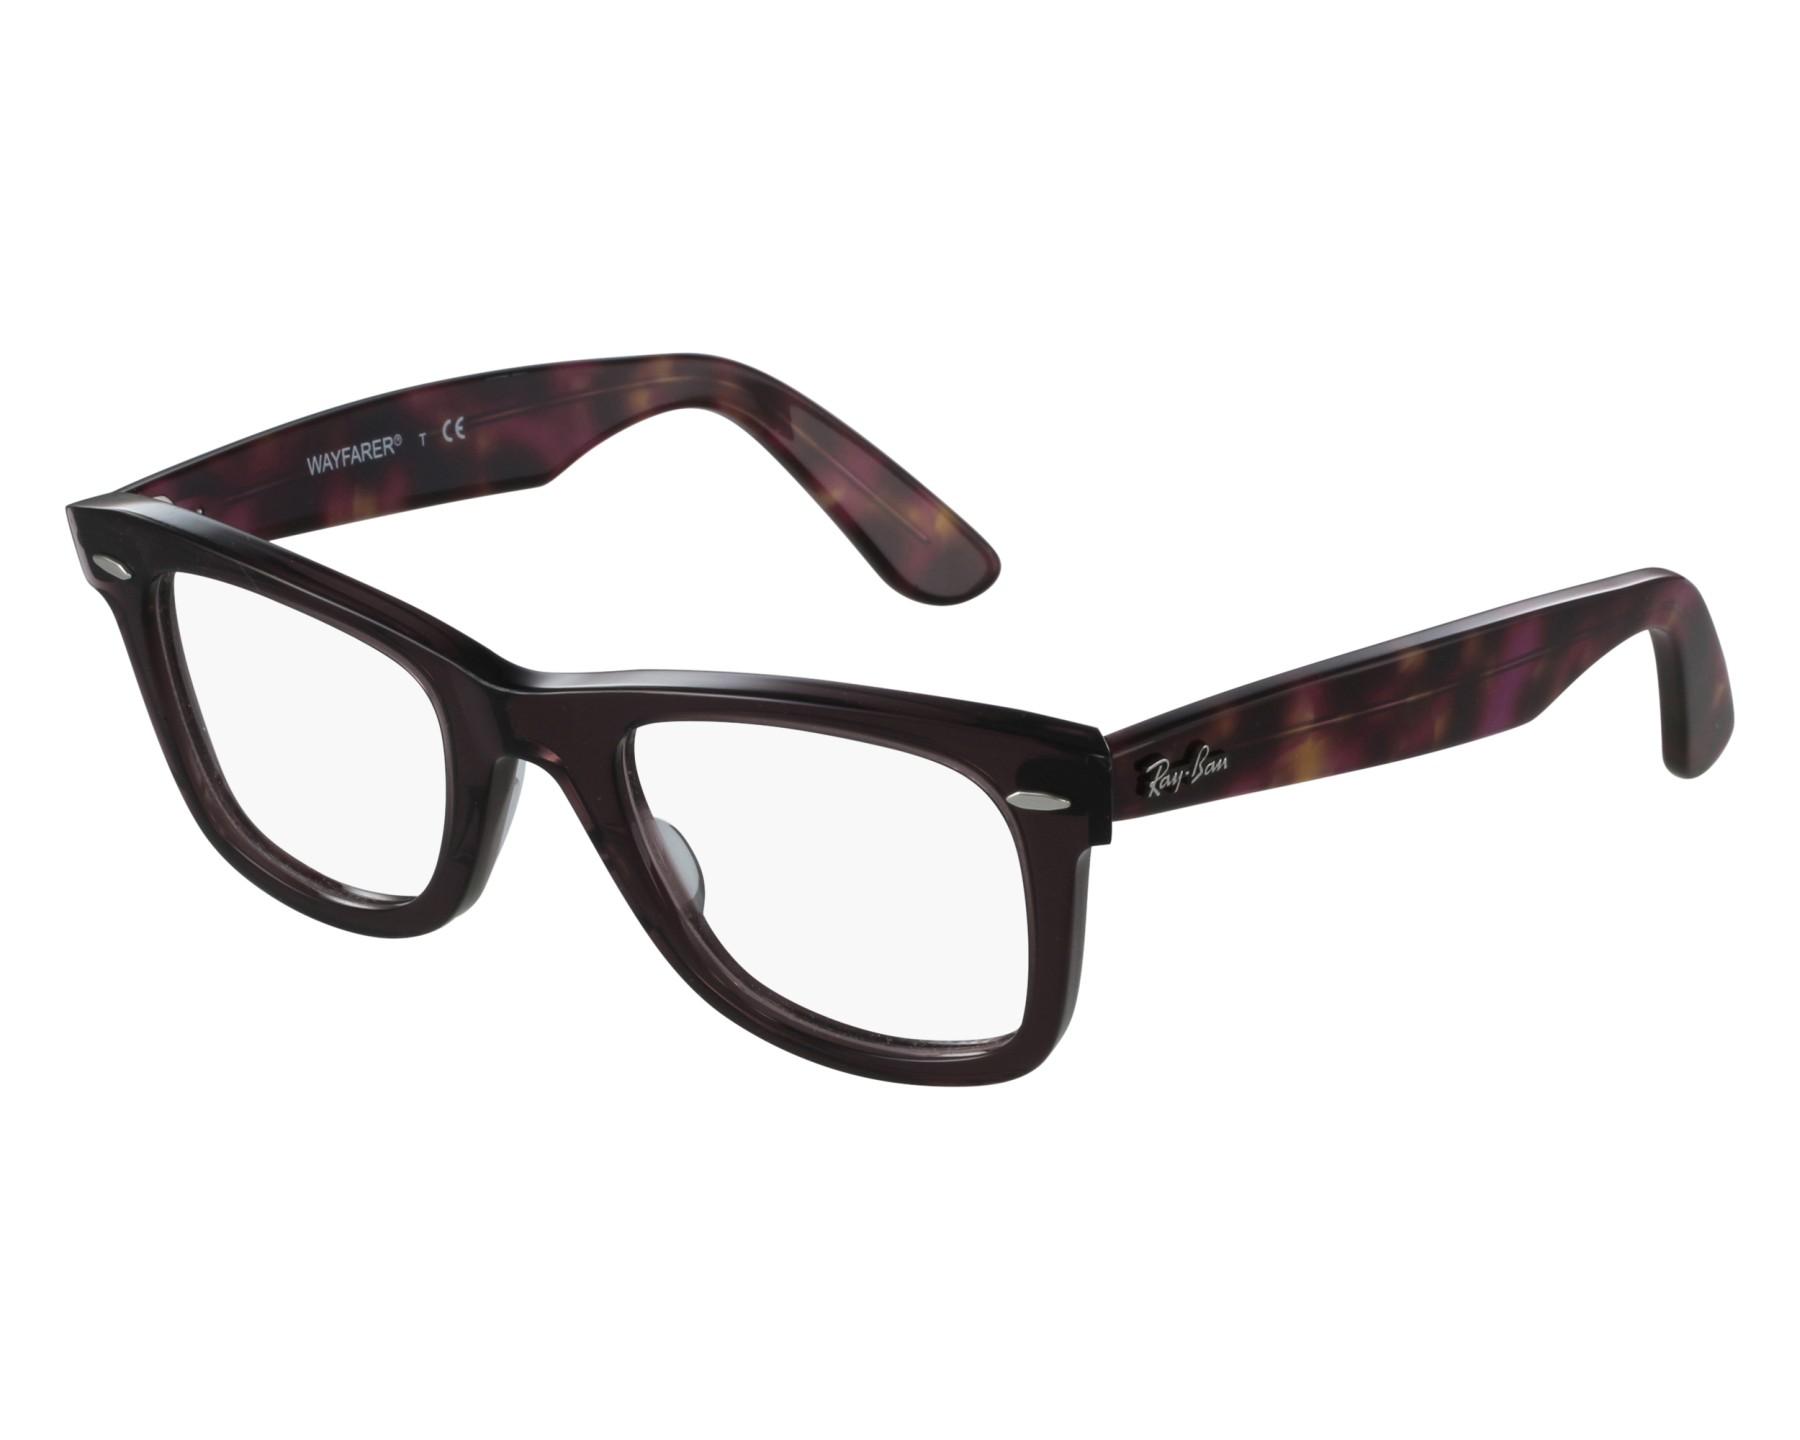 624e80676d eyeglasses Ray-Ban RX-5121 5628 50-22 Plum Havana front view